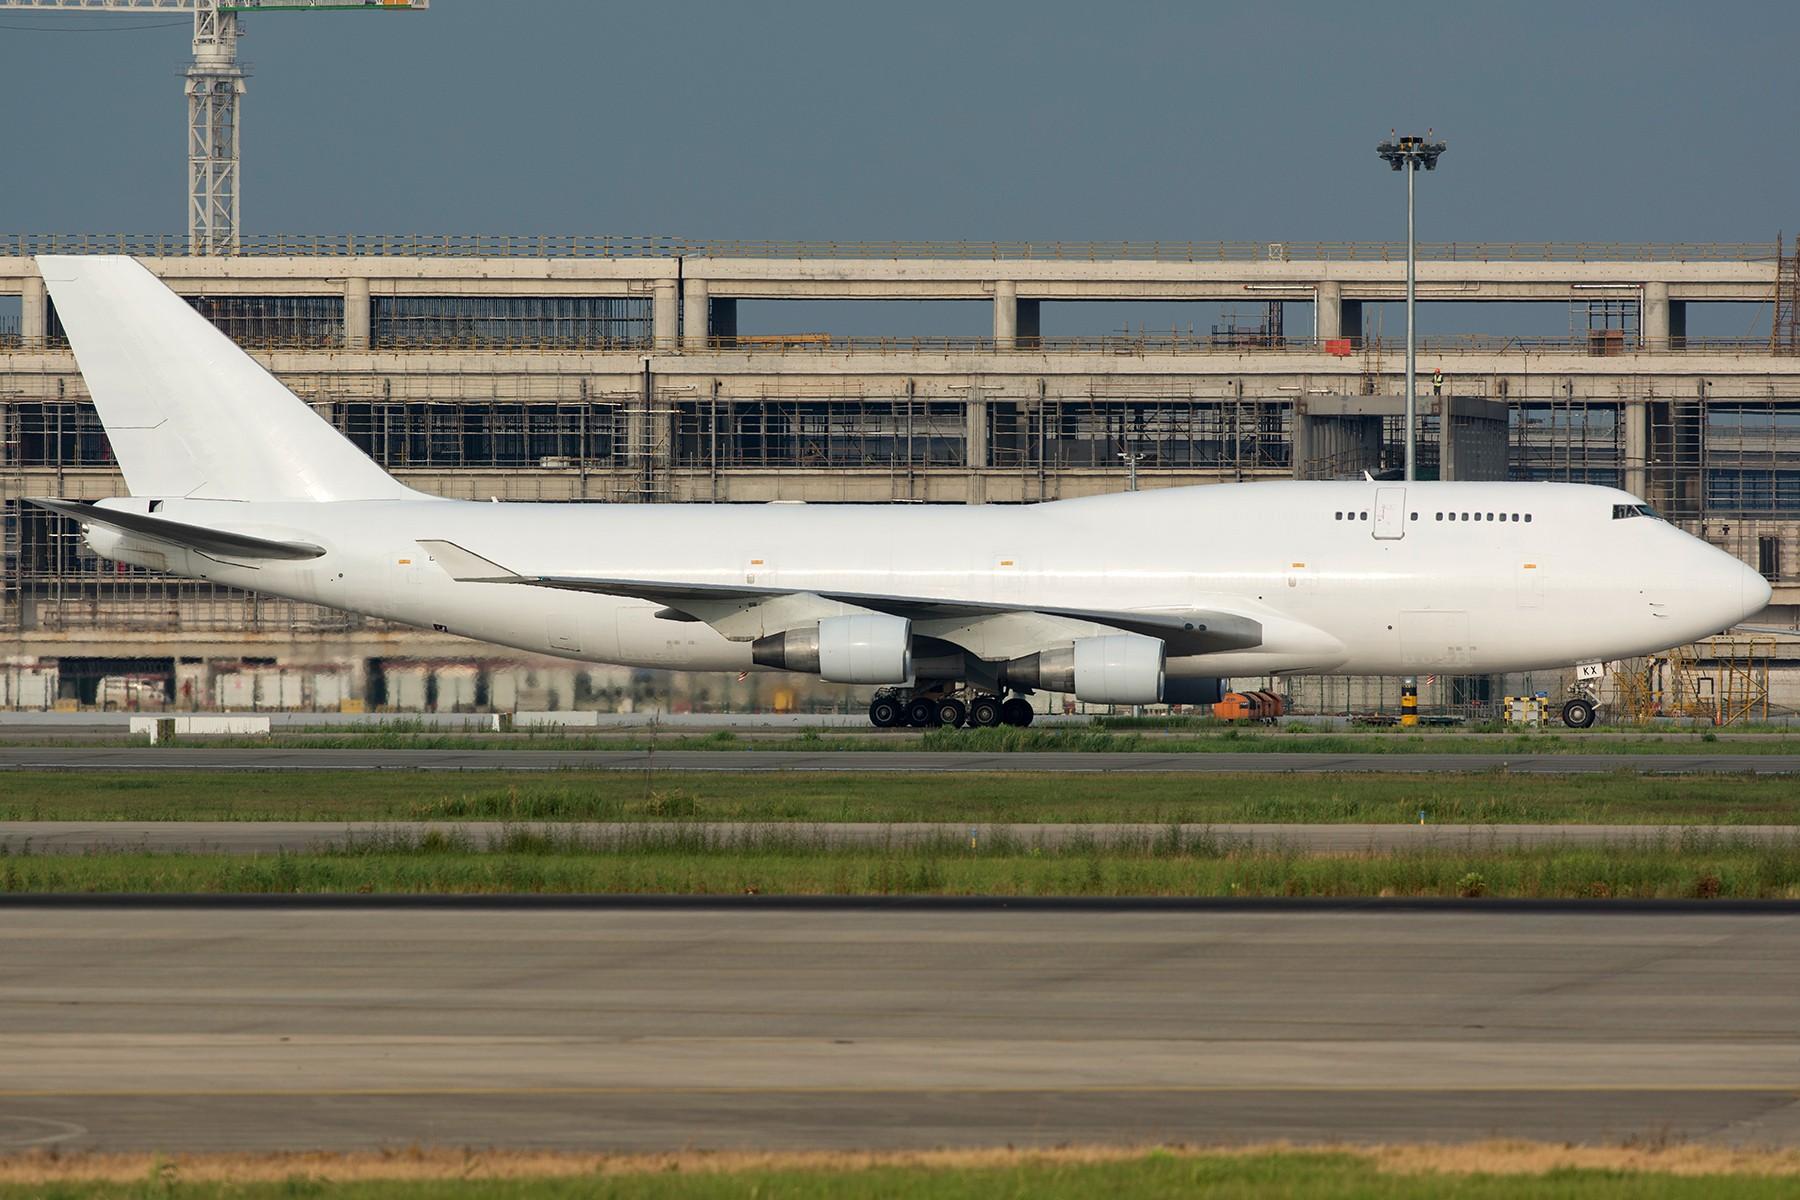 Re:[原创]【PVG】大白斩鸡一组 BOEING 747-400 B-HKX 中国上海浦东国际机场